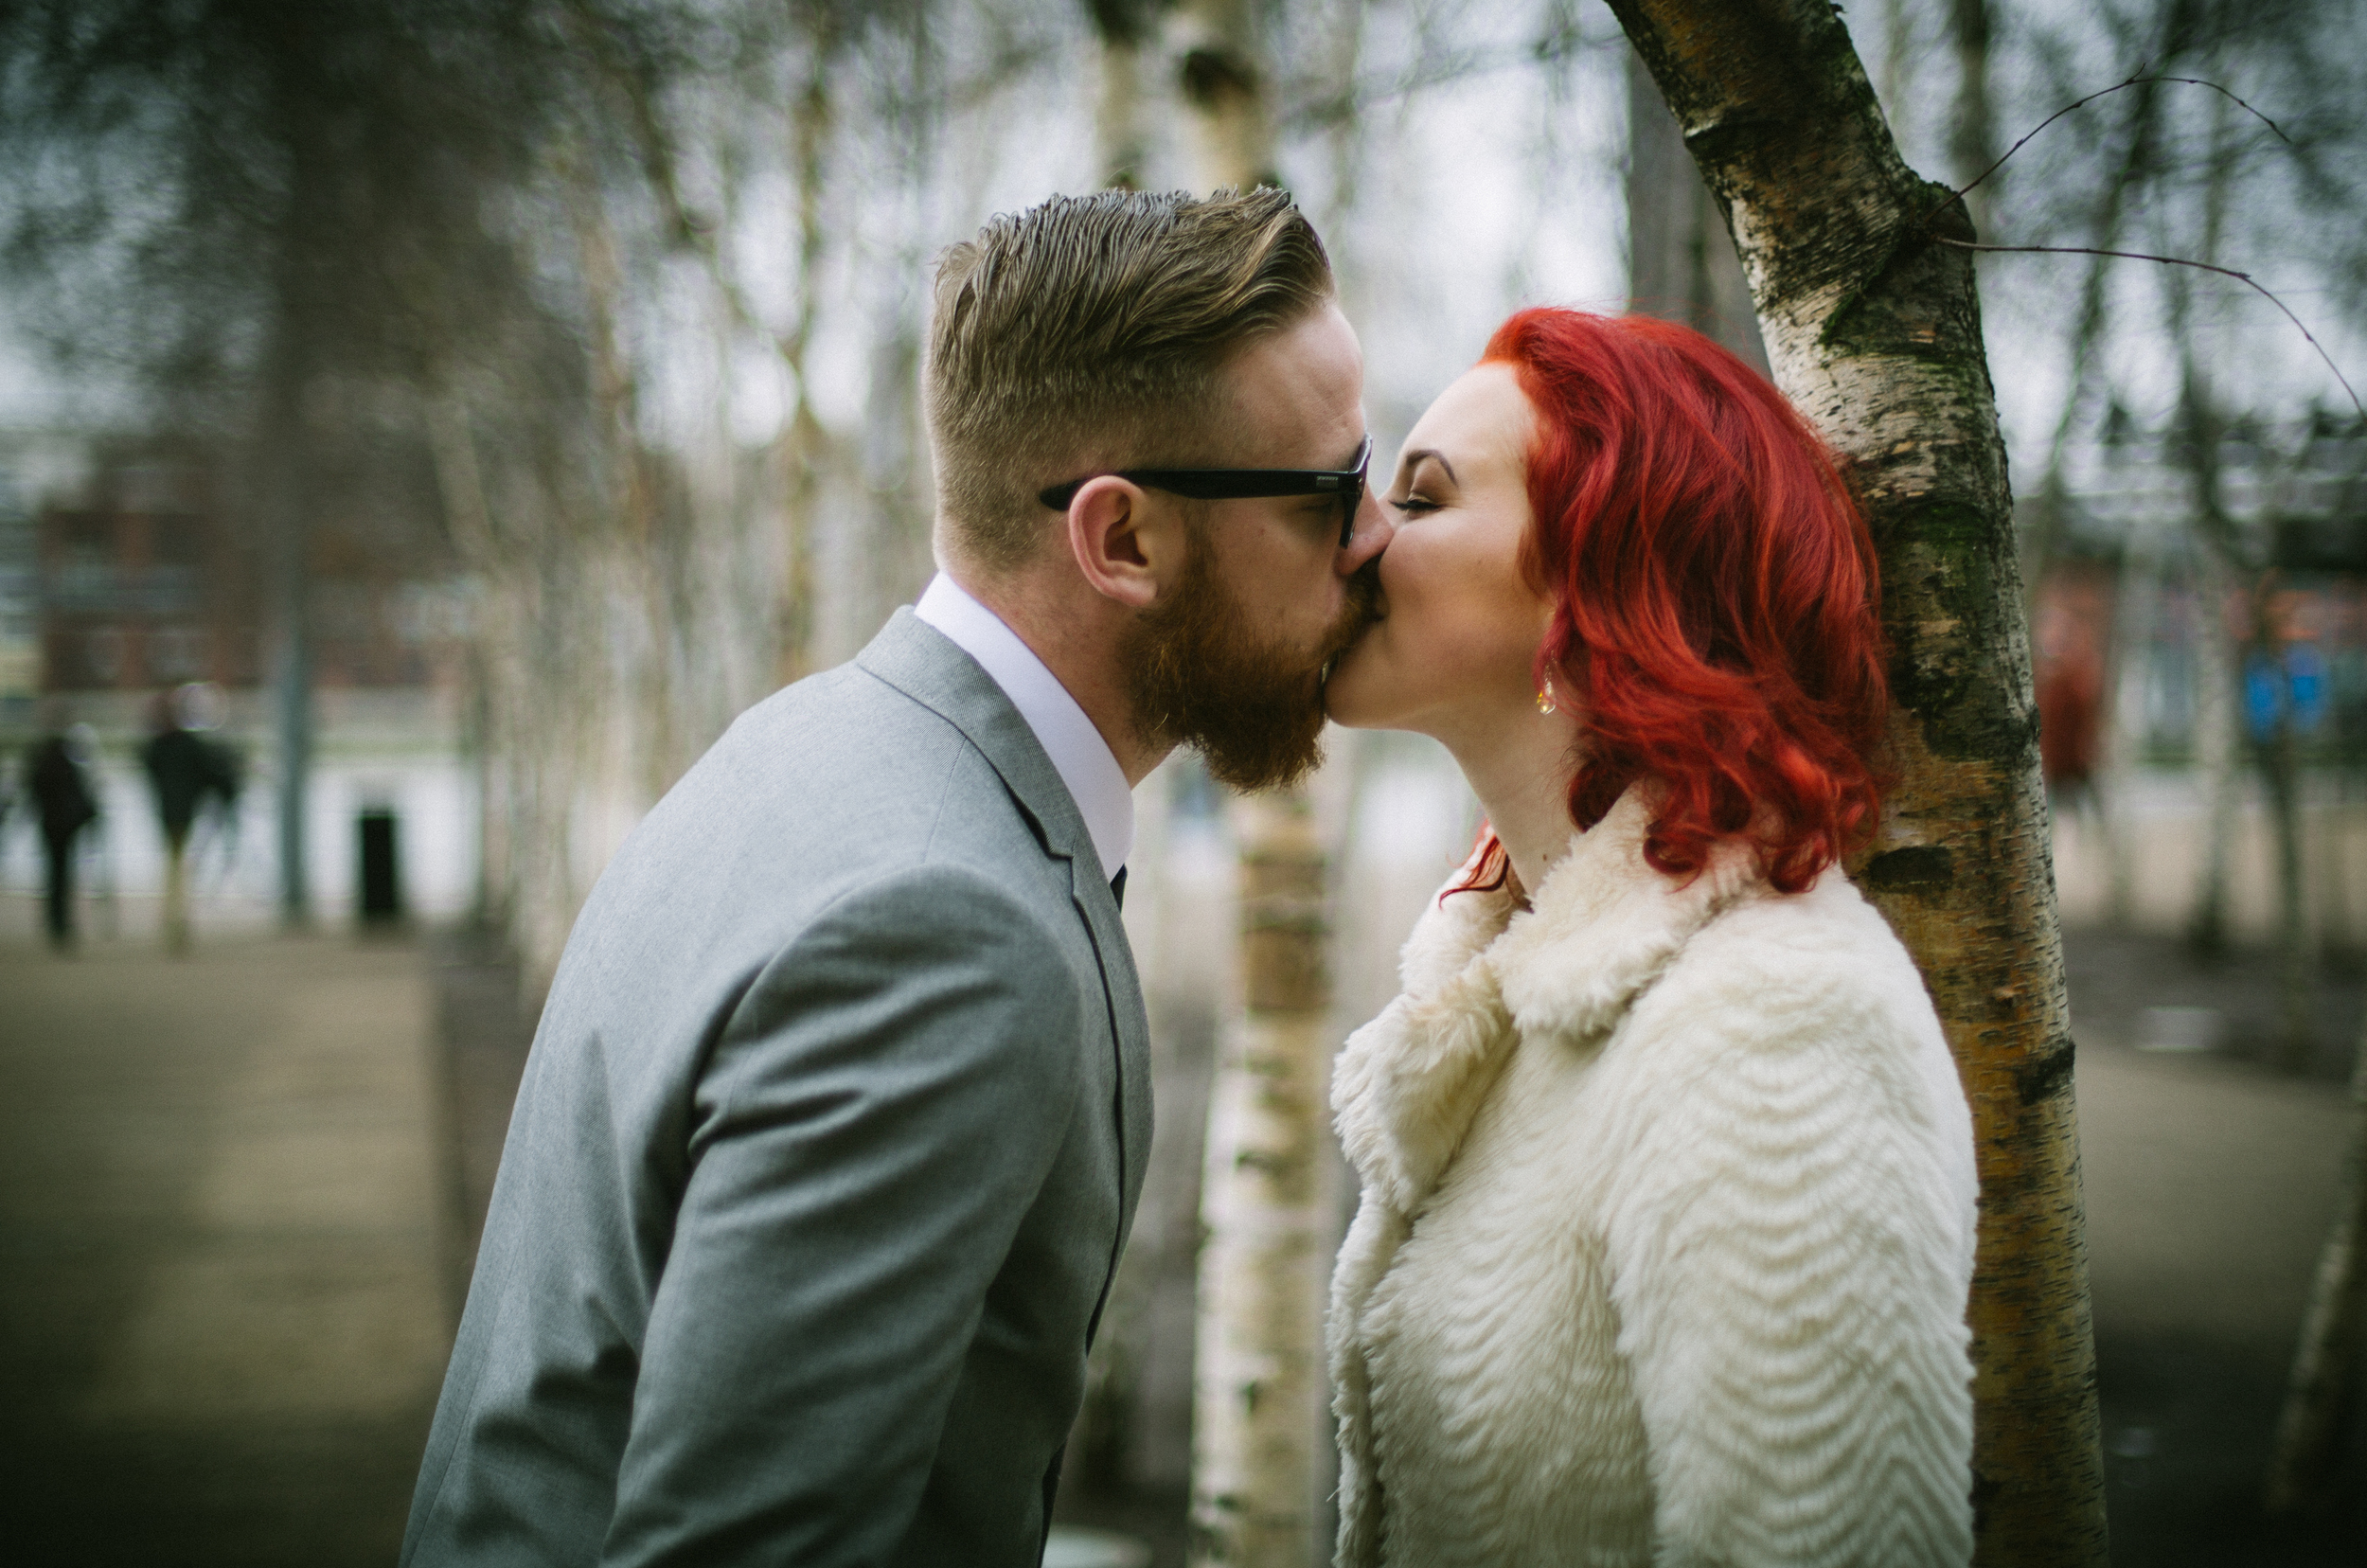 tare-modern-engagement-london-uk-destination-wedding-photography-Adam-Rowley